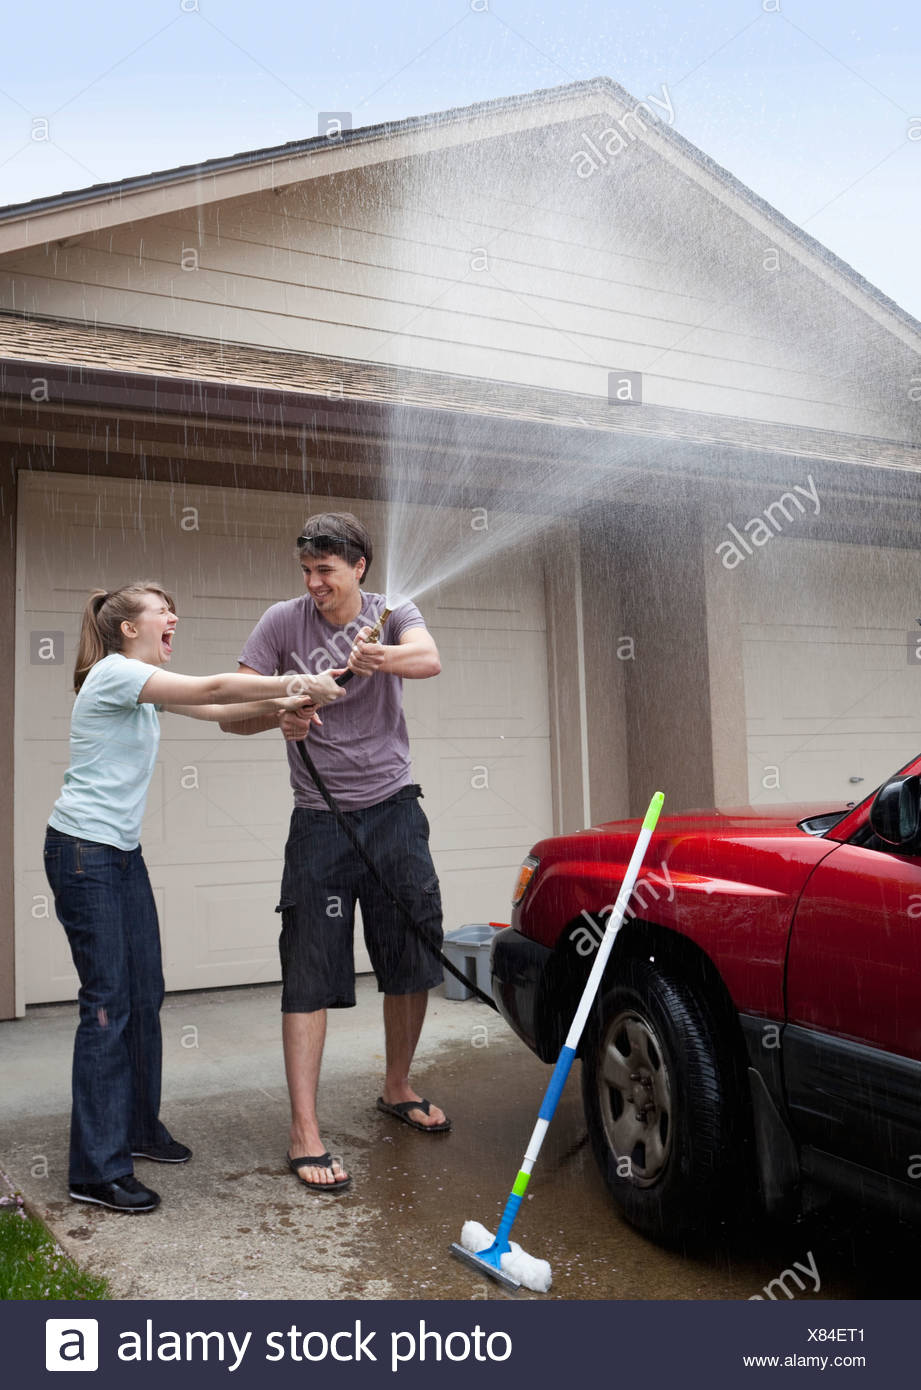 USA, Oregon, Ashland, young couple washing car in front of garage - Stock Image